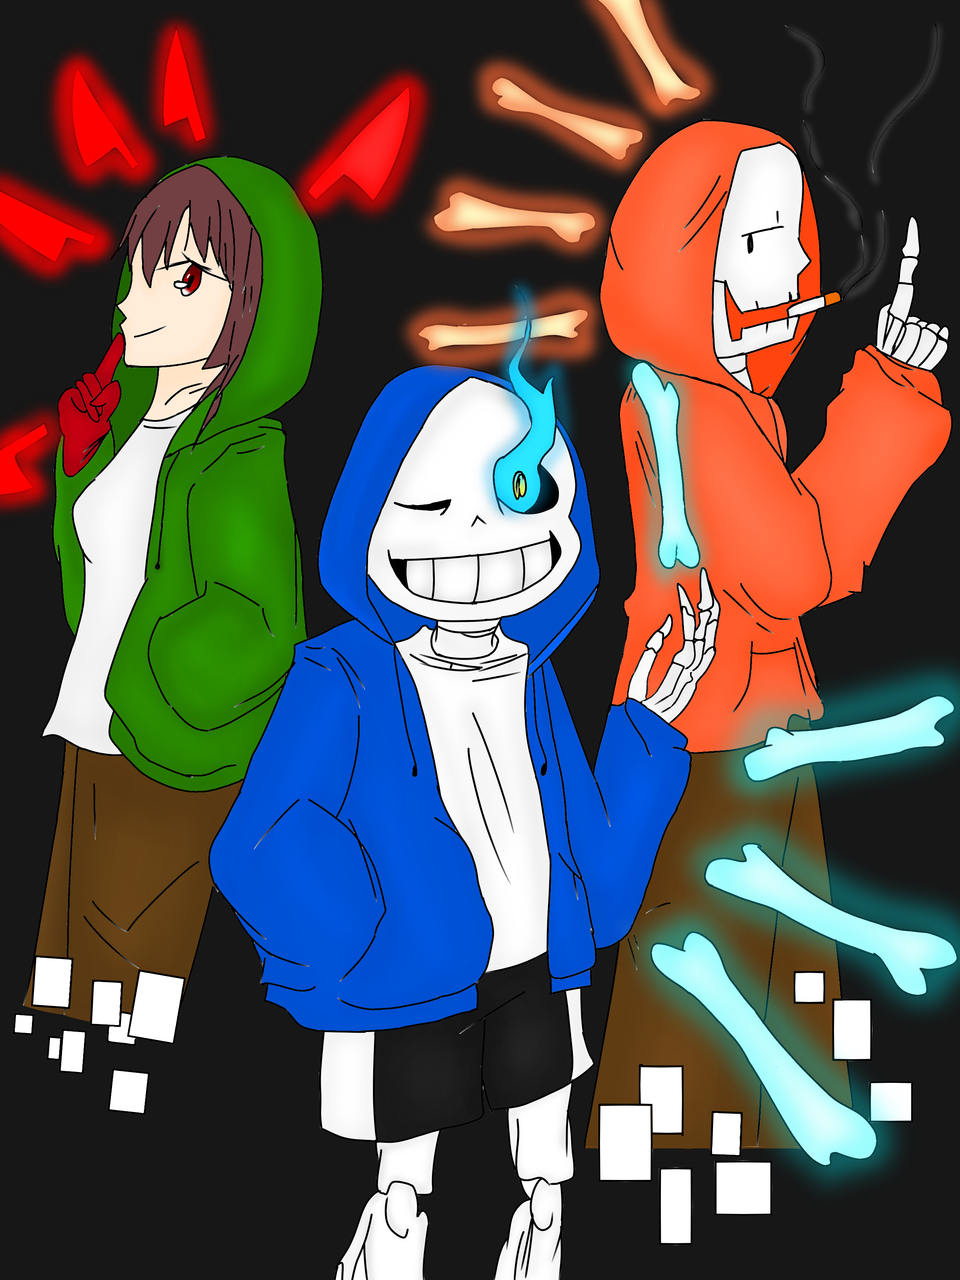 Bad Time Trio合作繪圖 Illust of 金兔 medibangpaint